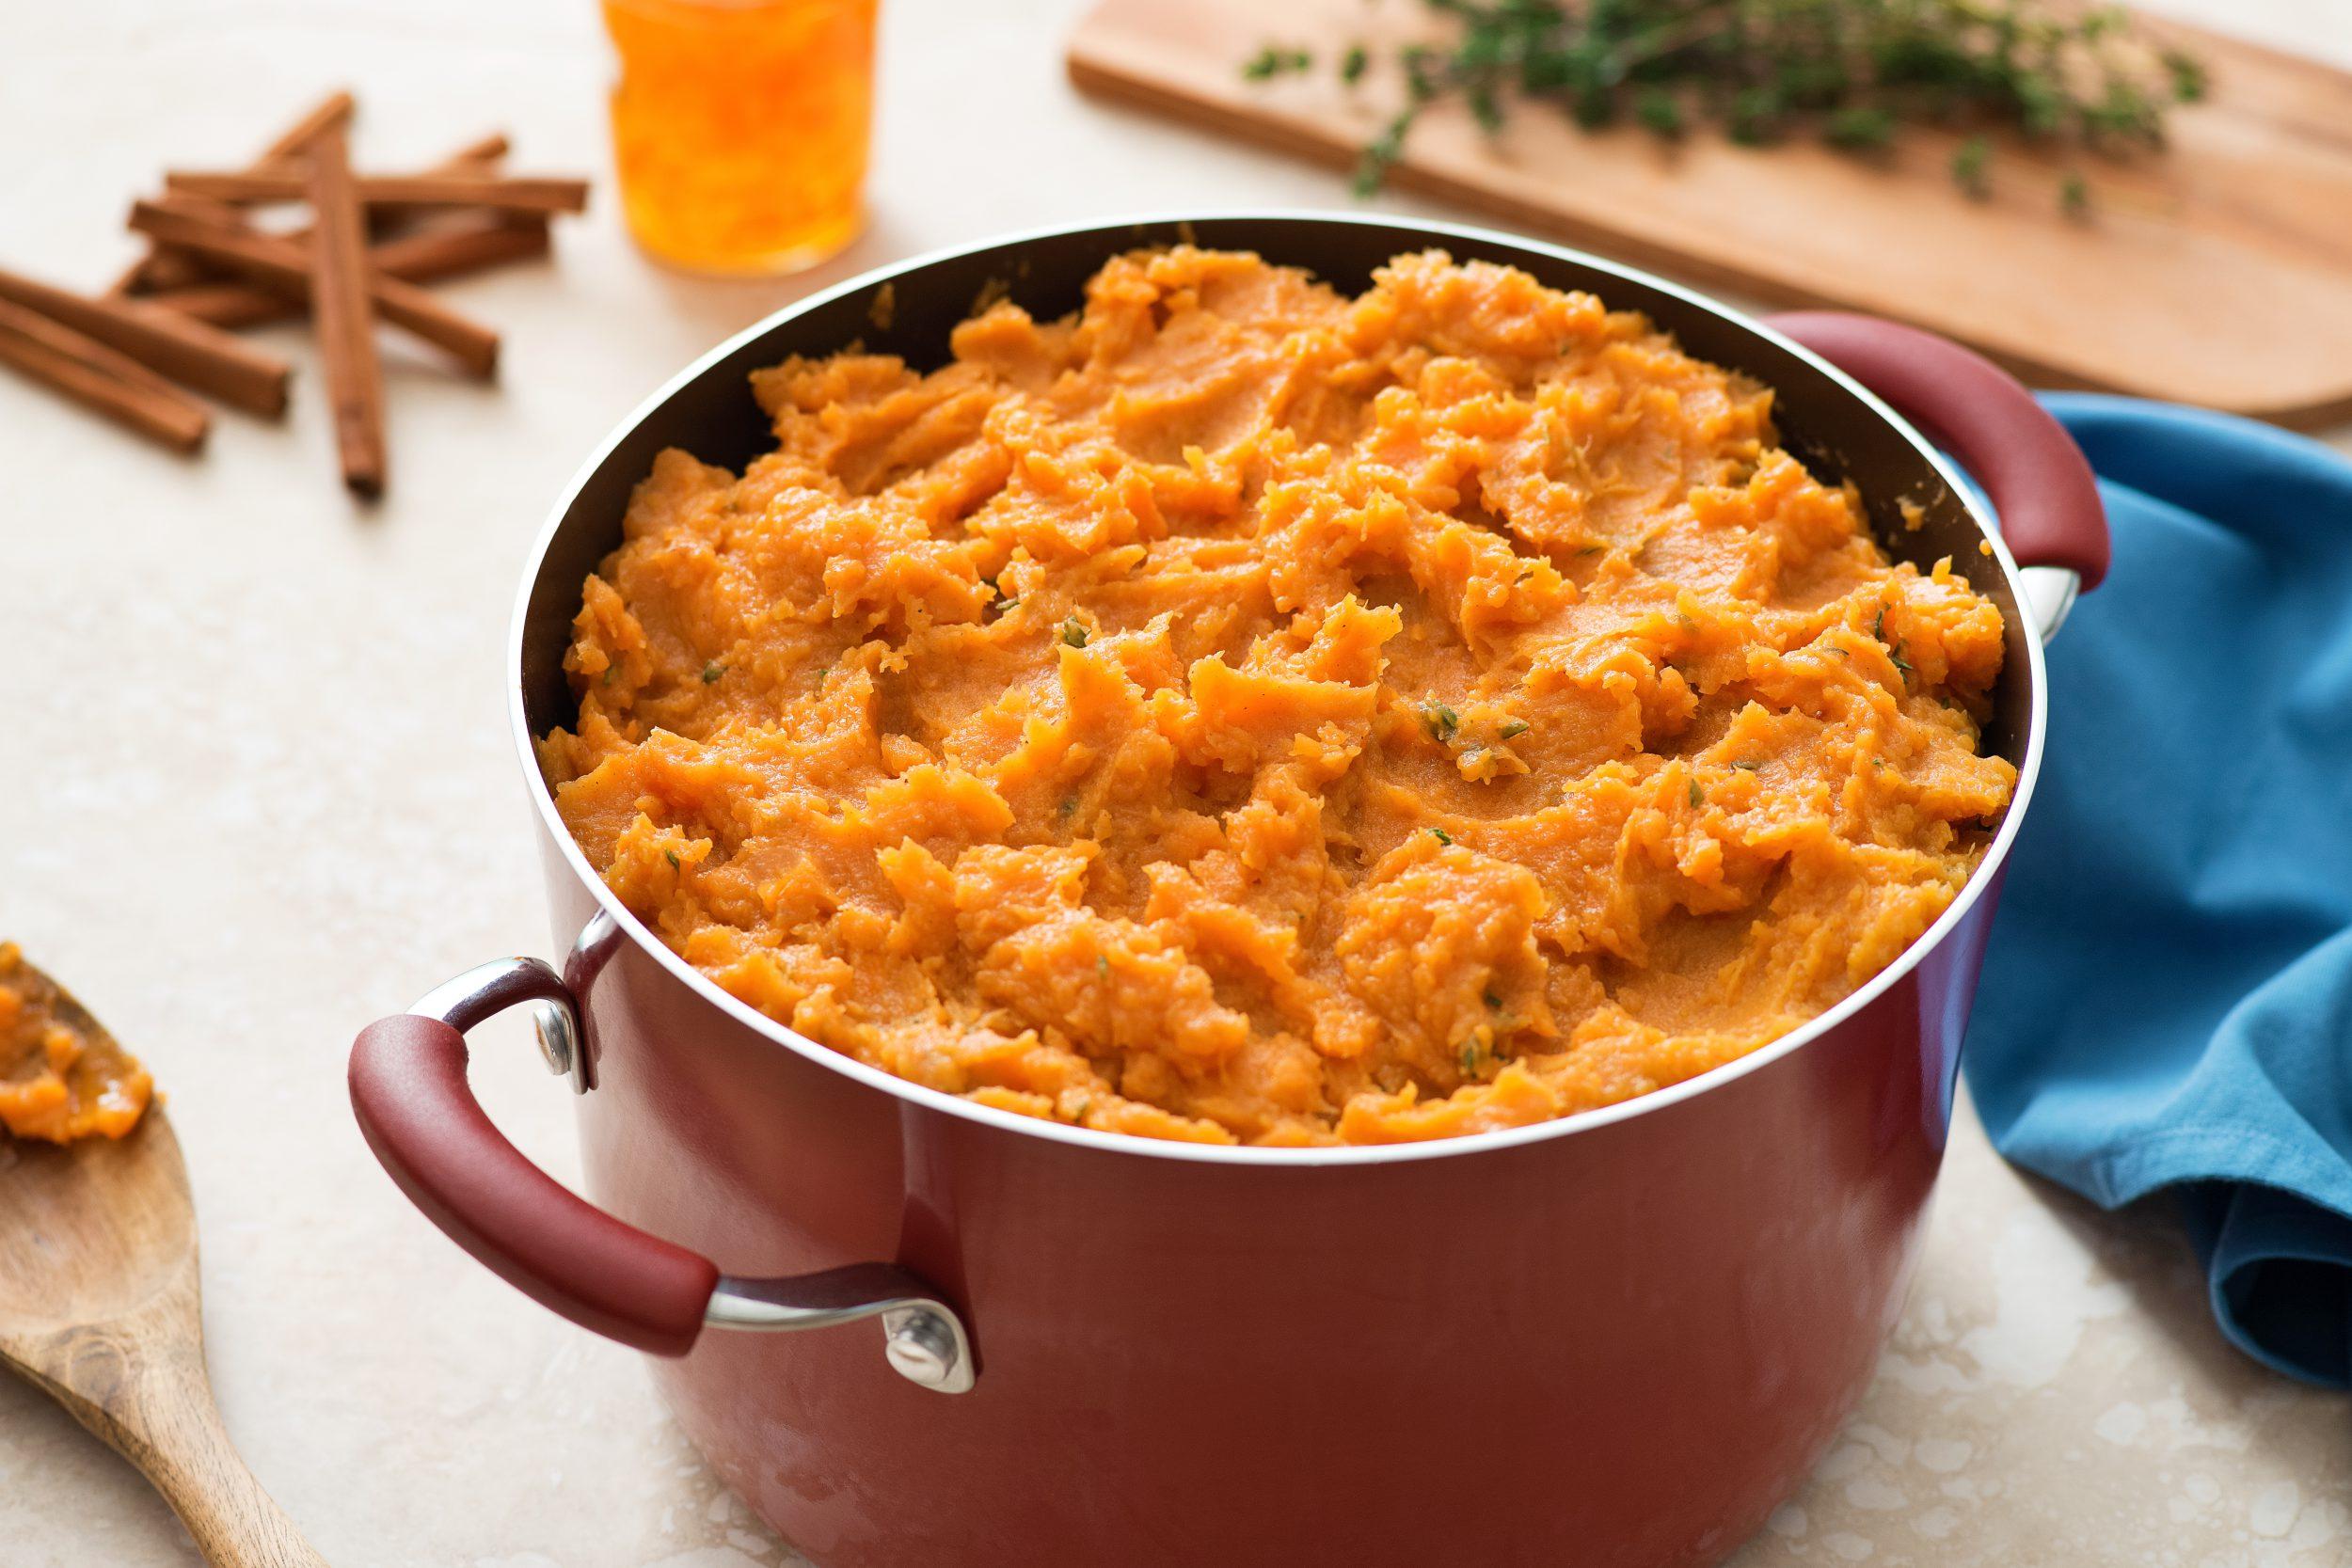 Orange You Glad It's Sweet Potato Mash